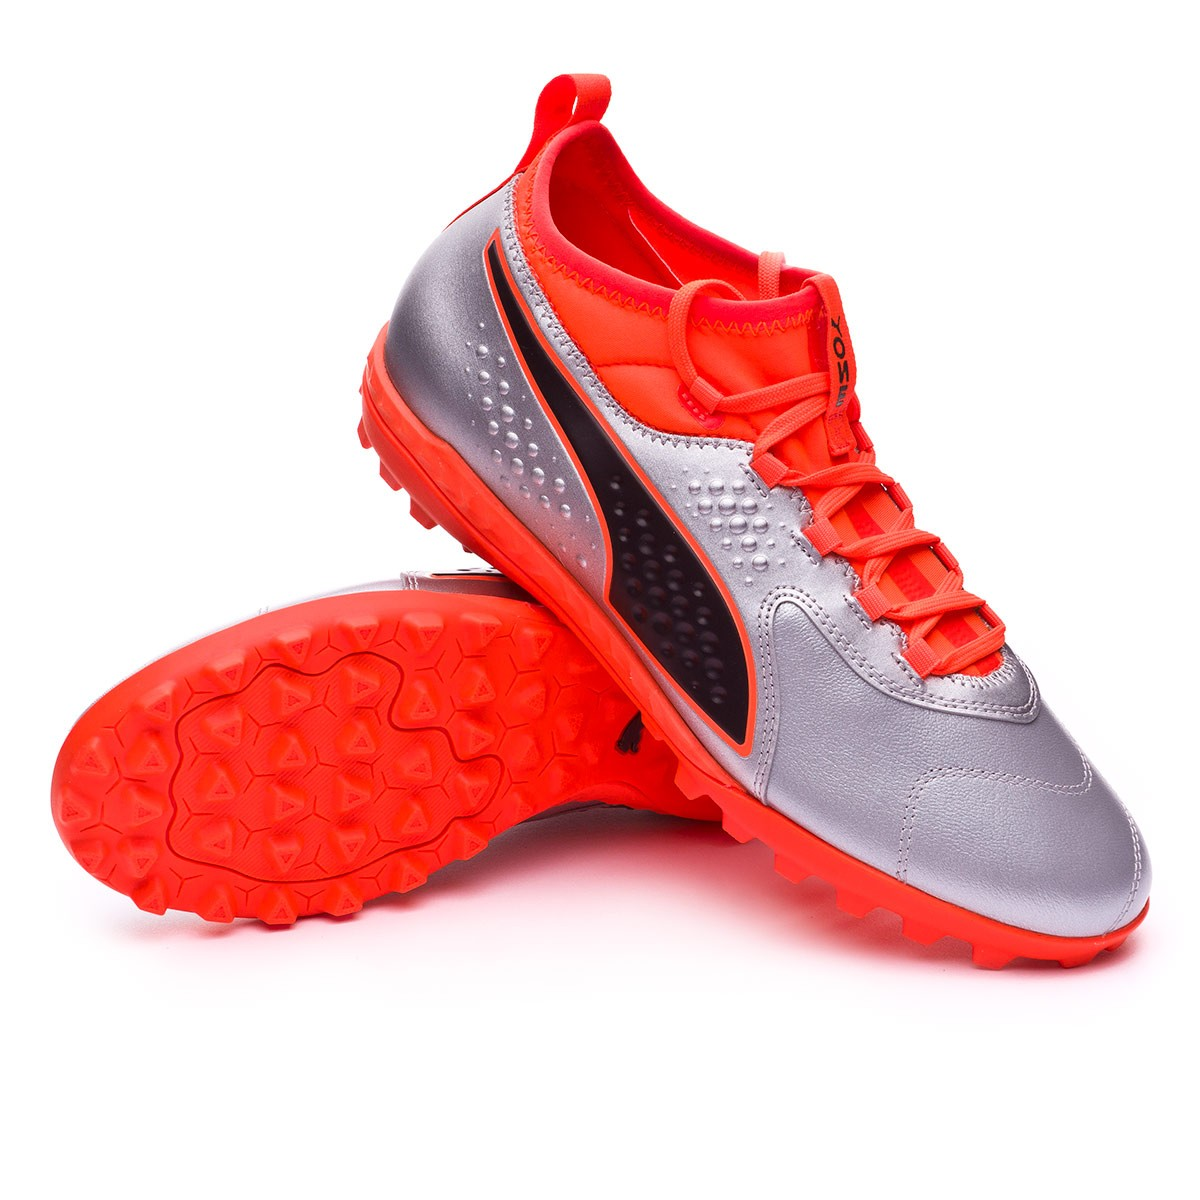 Football Boot Puma One 3 Leather TT